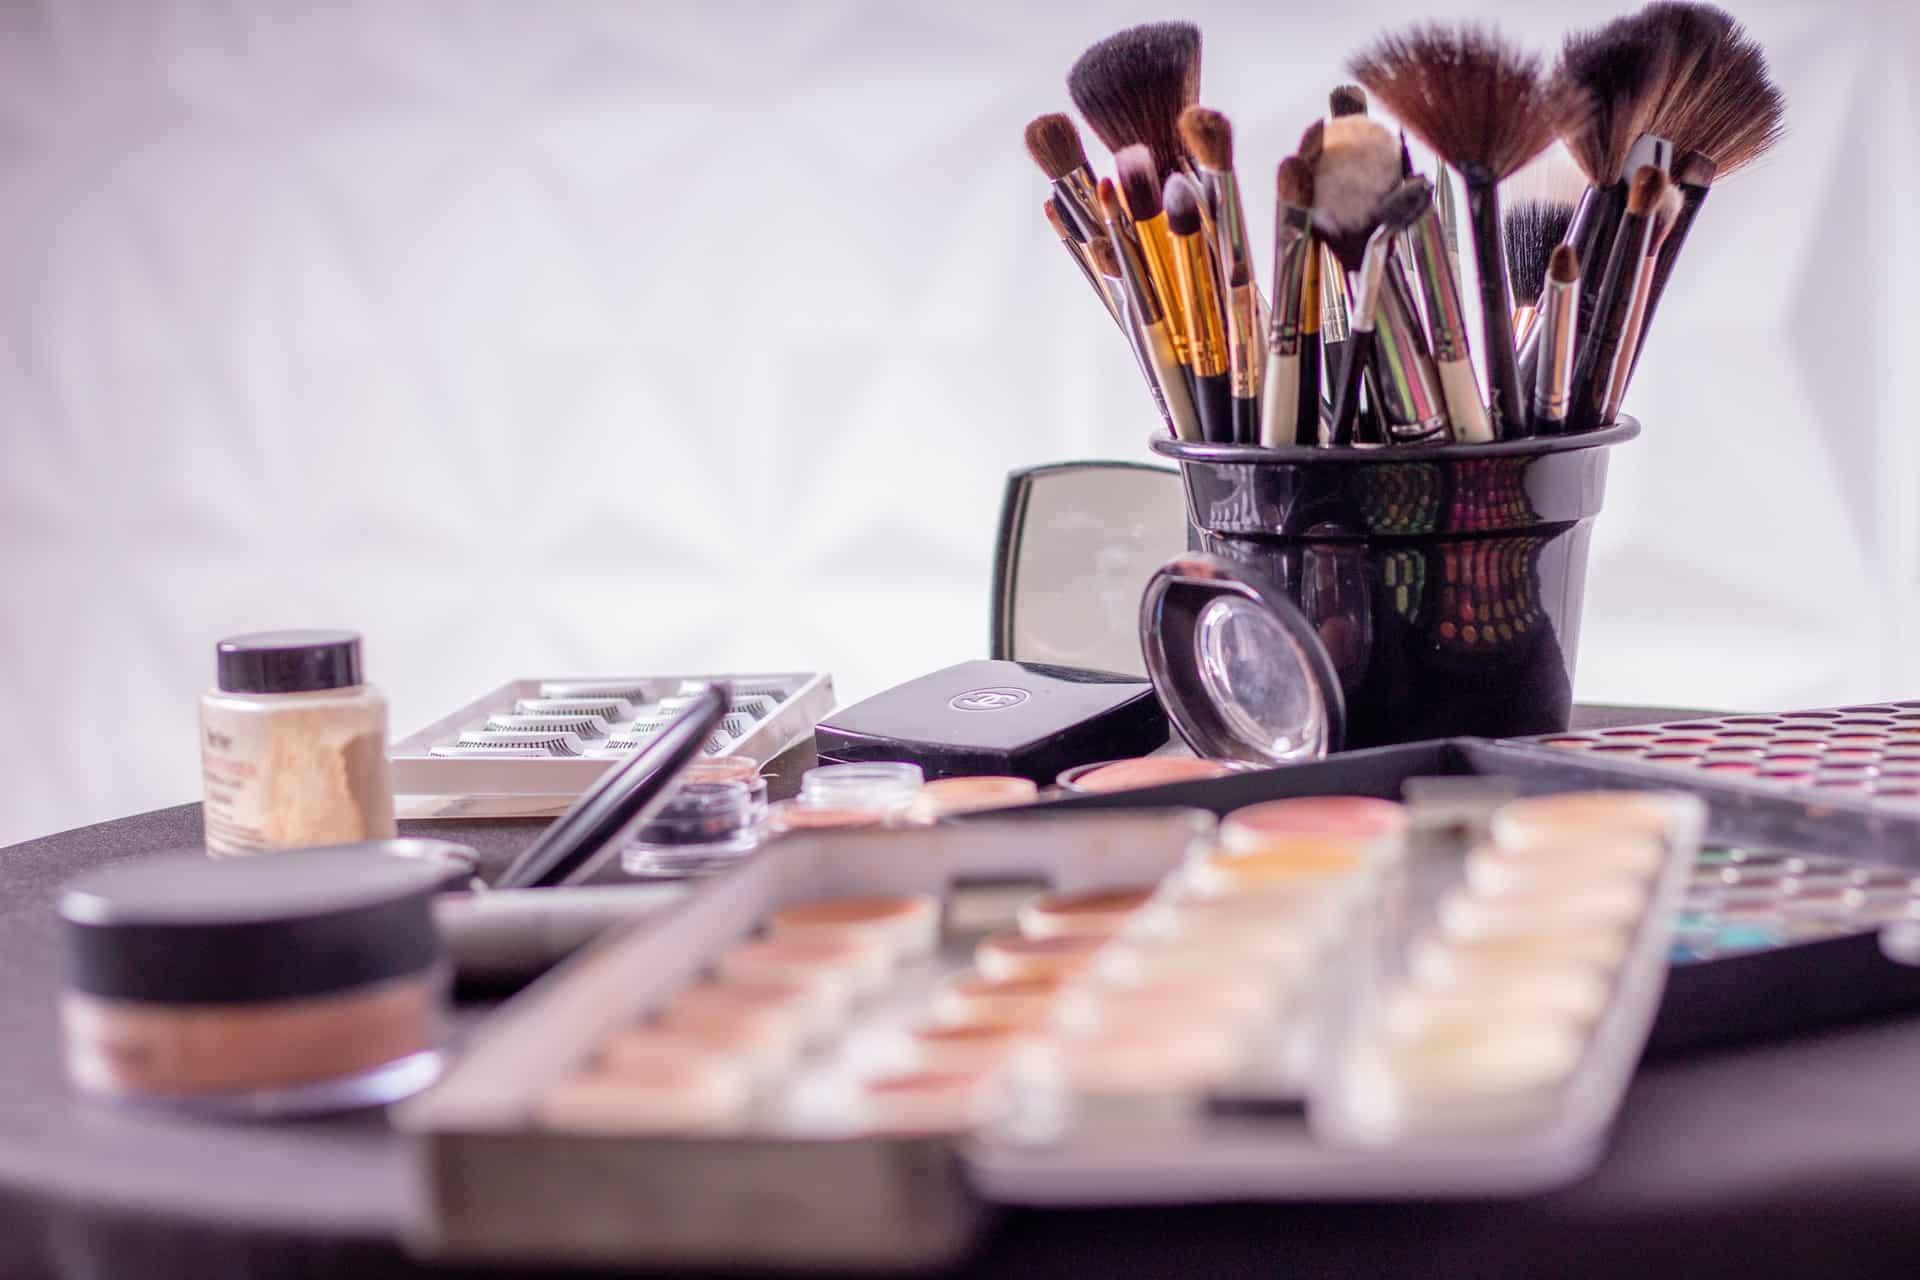 Assorted Make Up